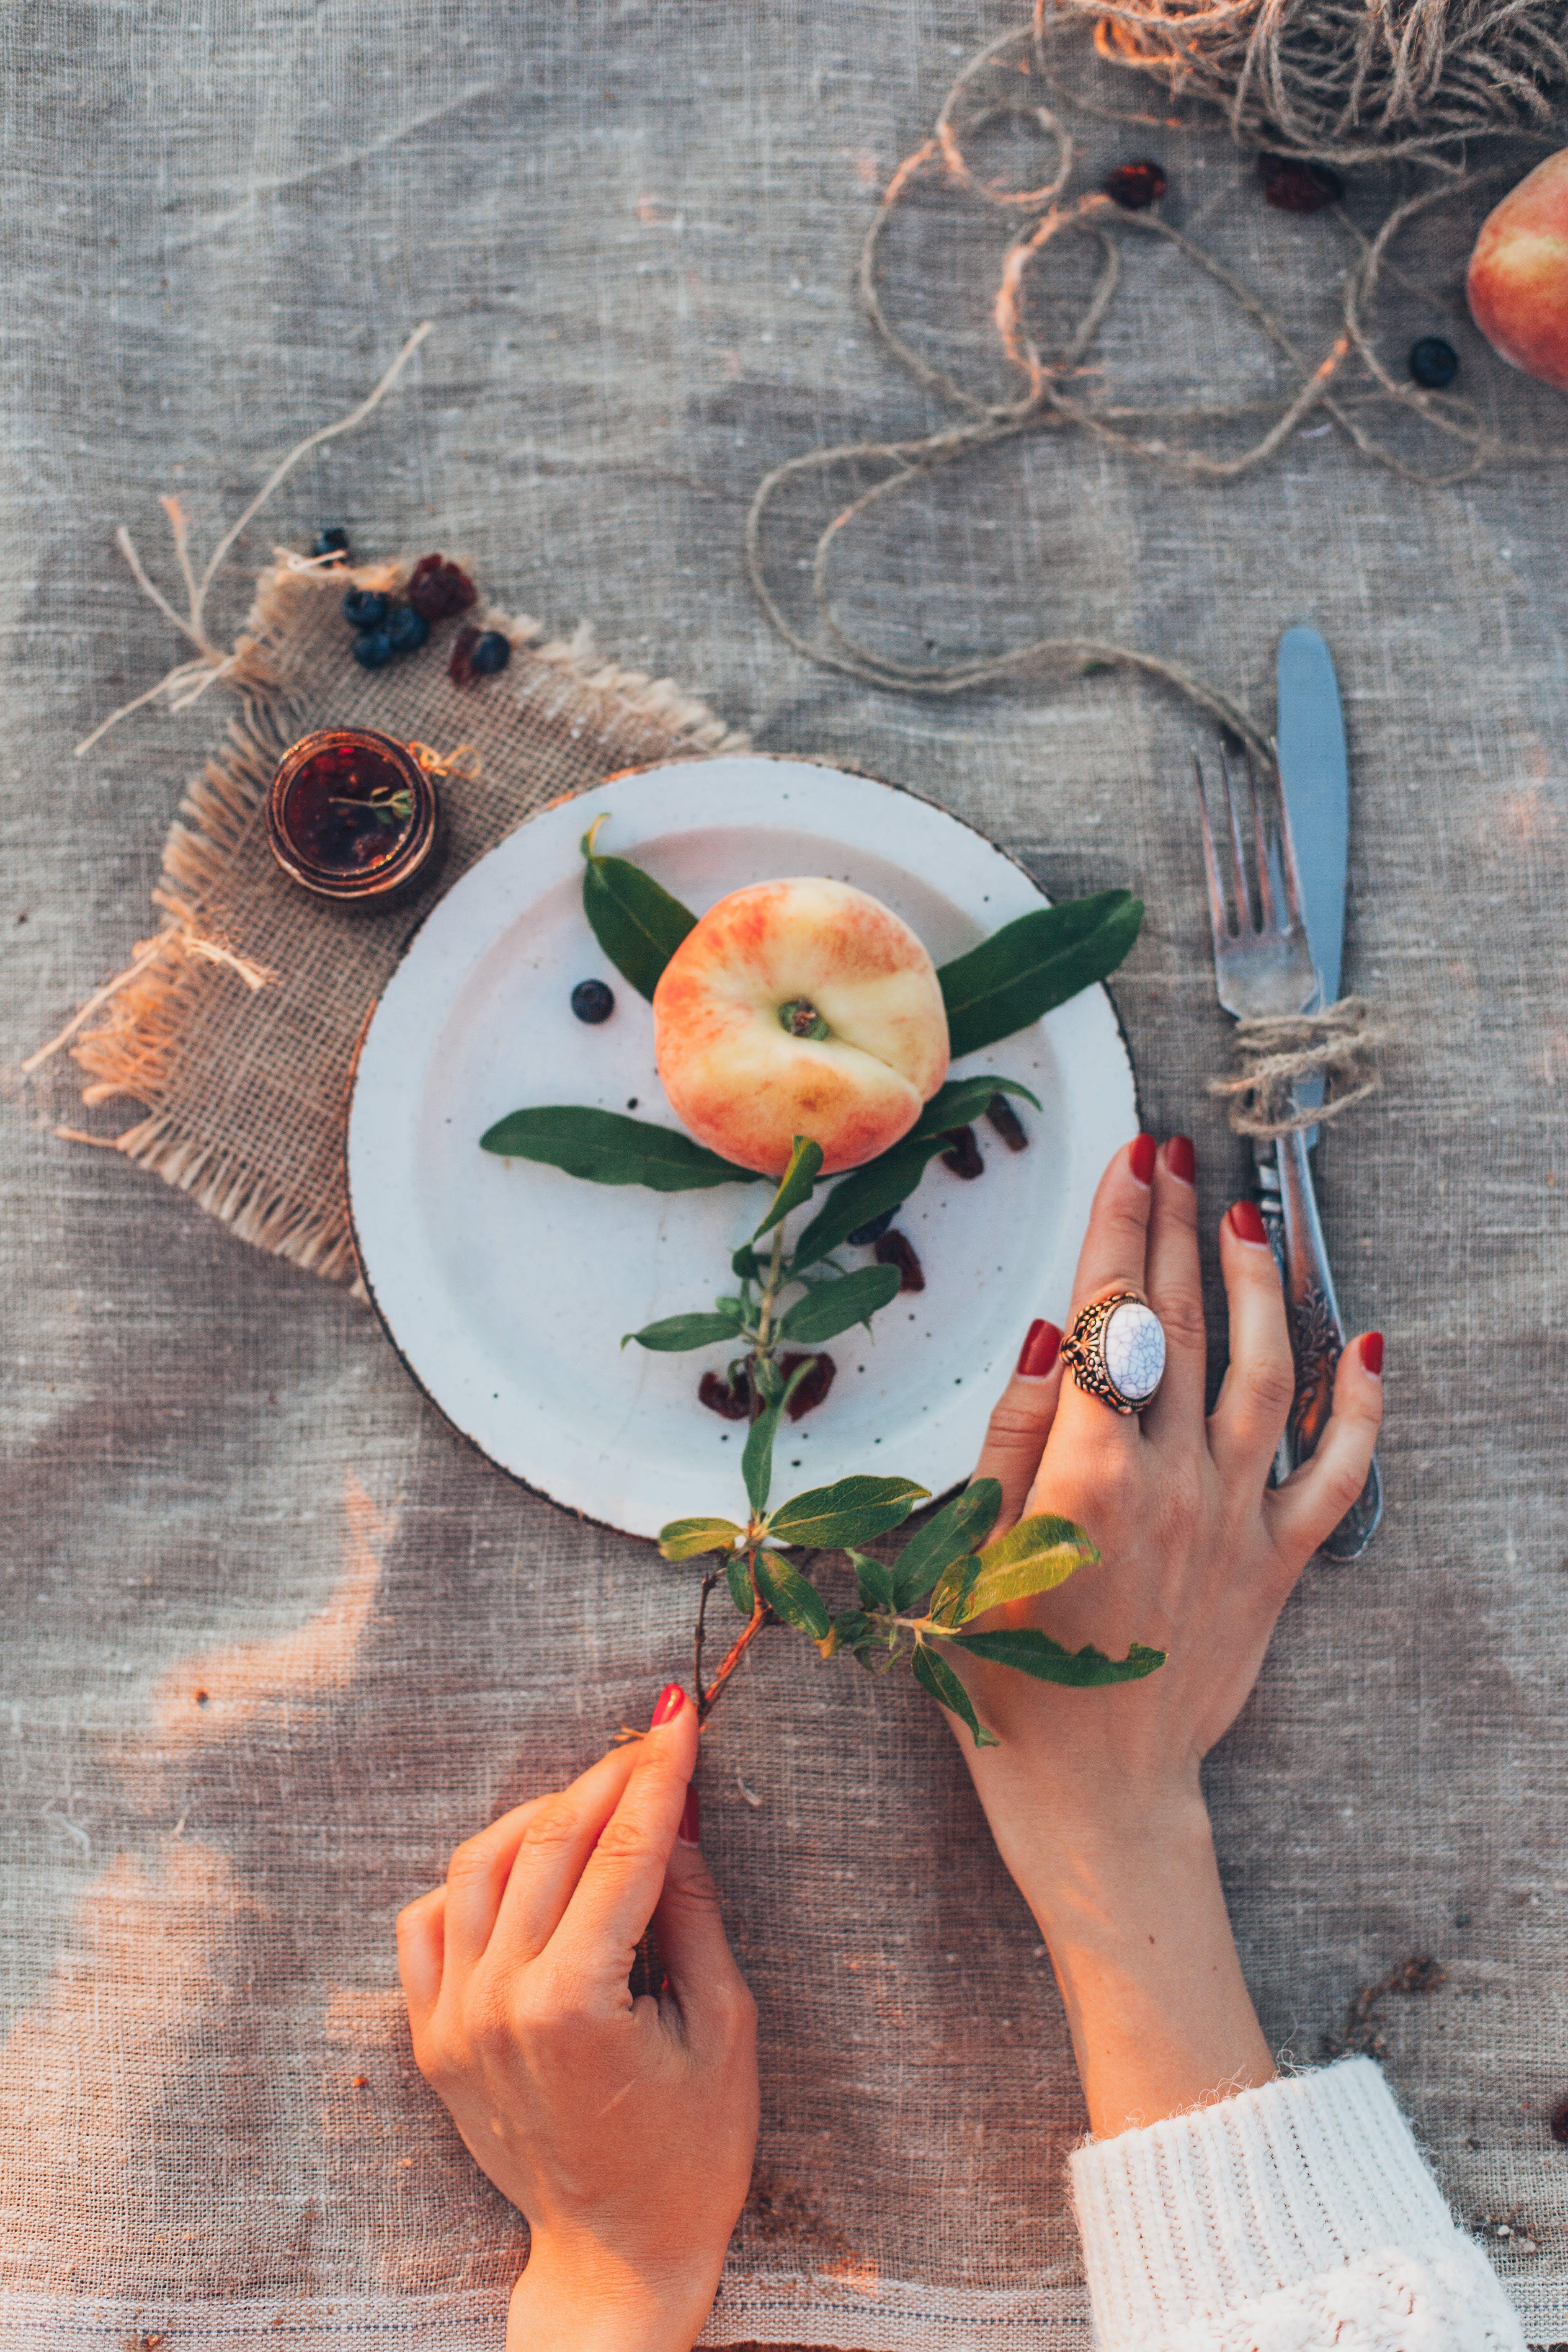 Fotos de stock gratuitas de comida, Fruta, manos, plato